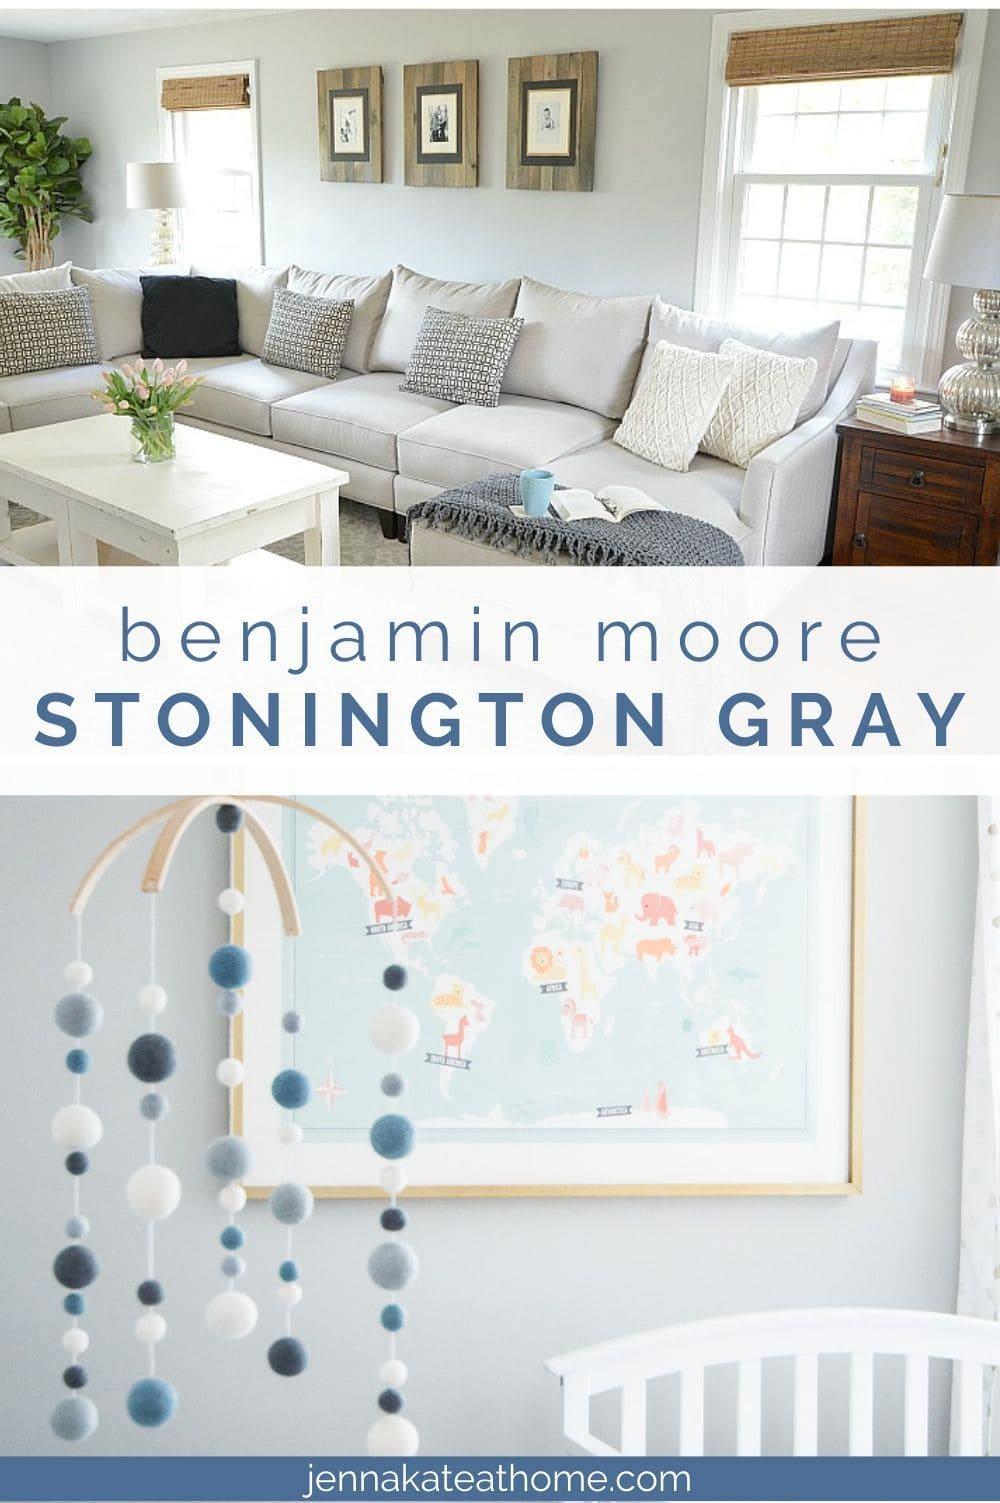 benjamin moore stonington gray paint review